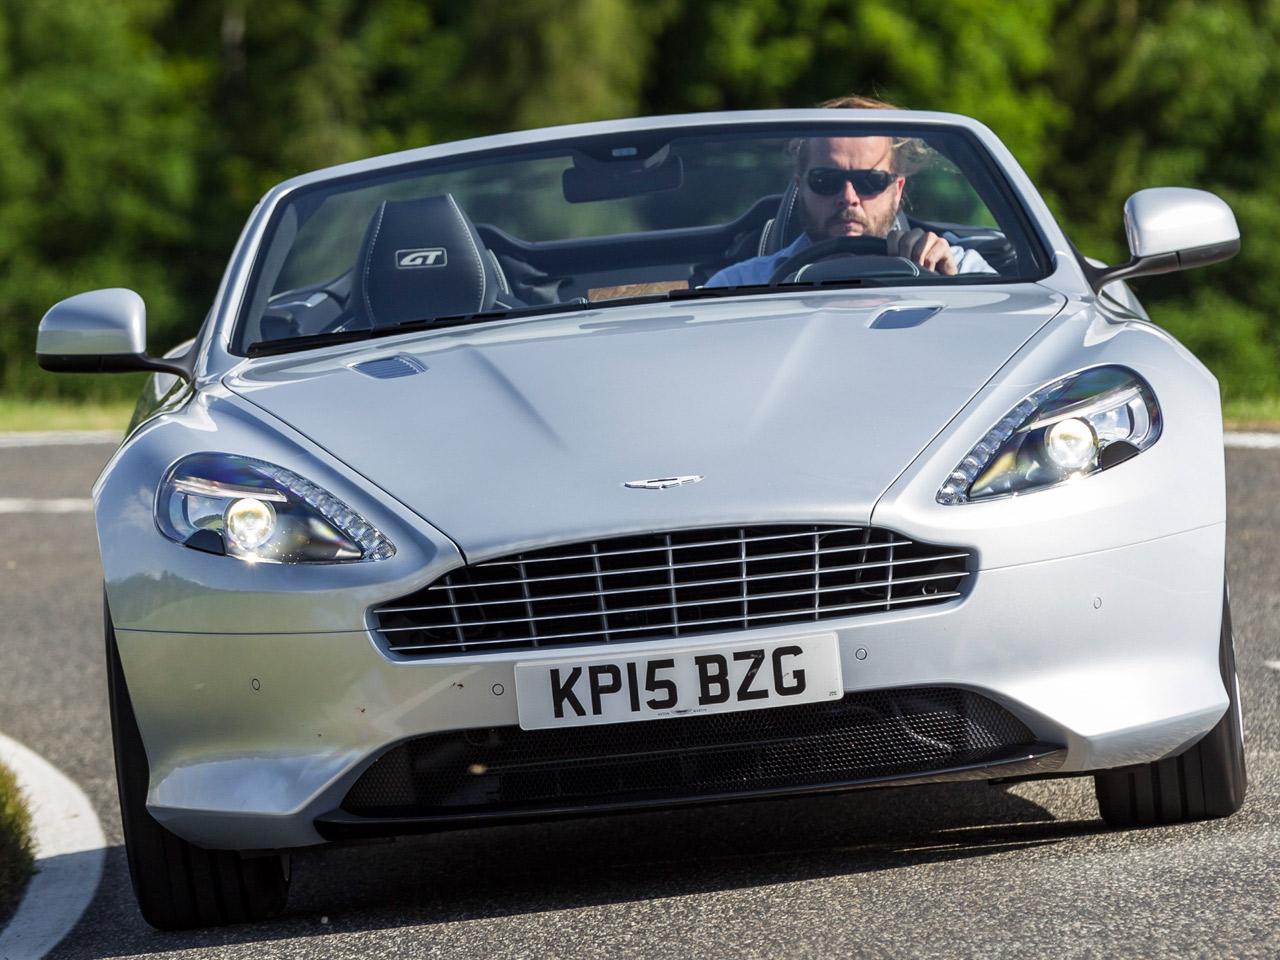 Aston Martin Db9 Gt Volante Fahrbericht Autozeitung De